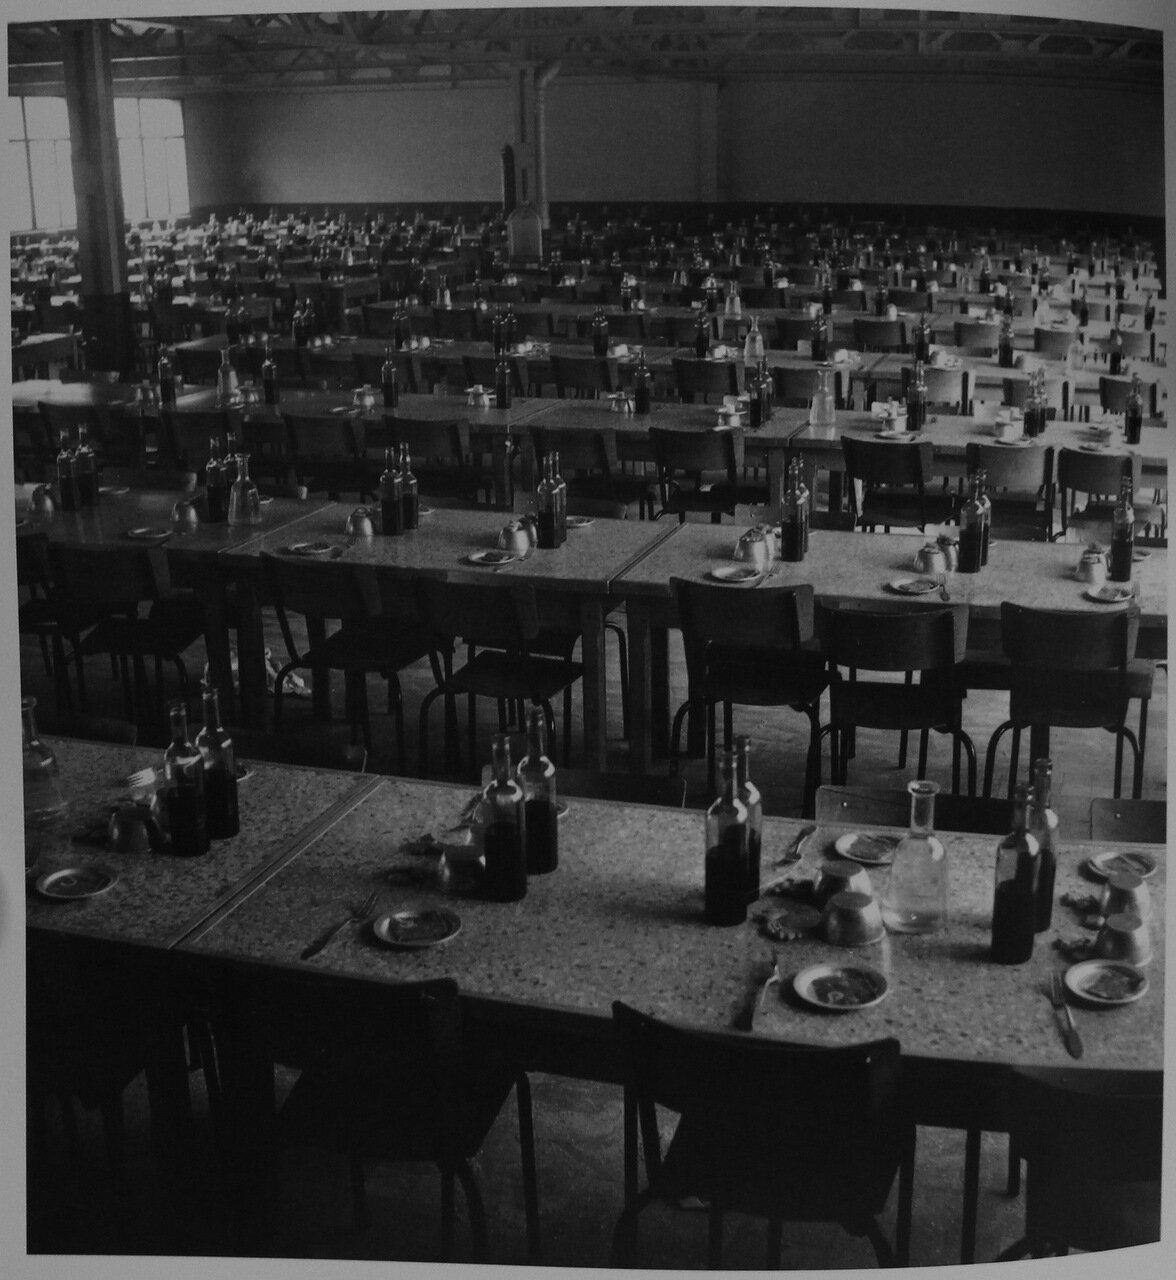 1951. Столовая Рено, Булонь-Бийанкур